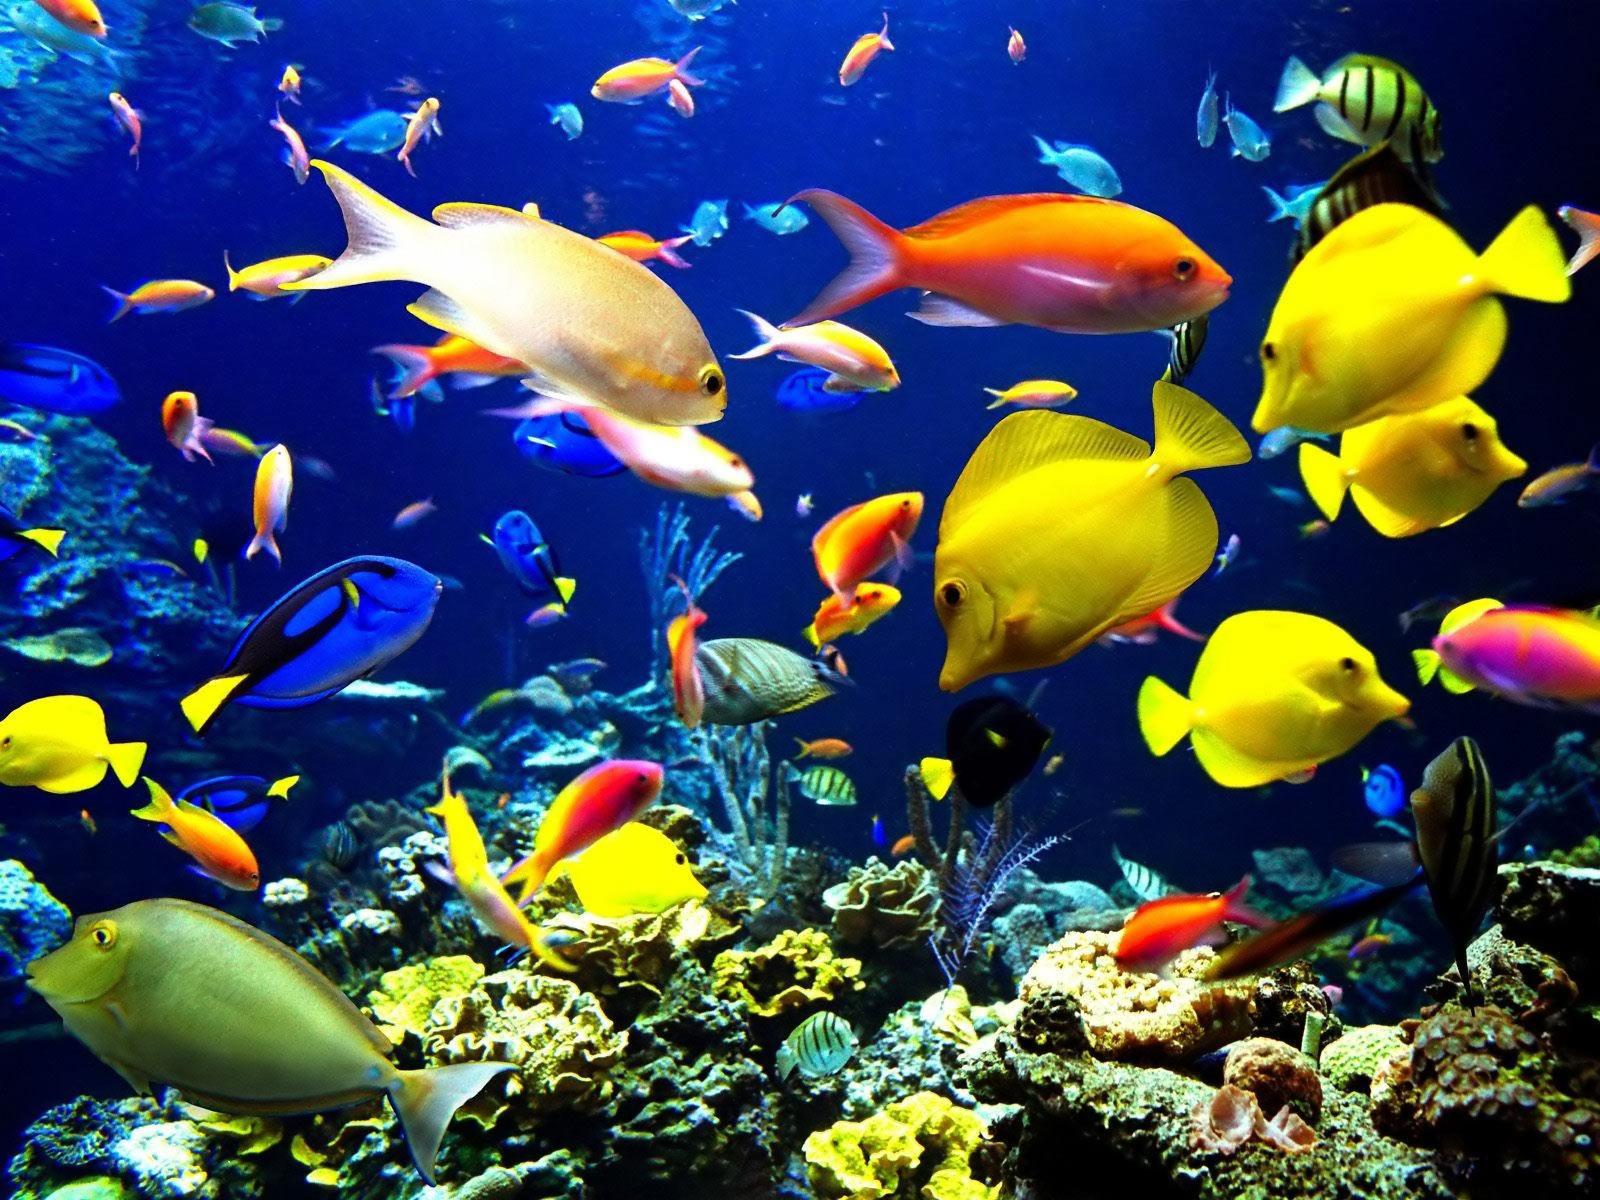 desktop hd fish live wallpaper desktop hd fish moving backgrounds 1600x1200